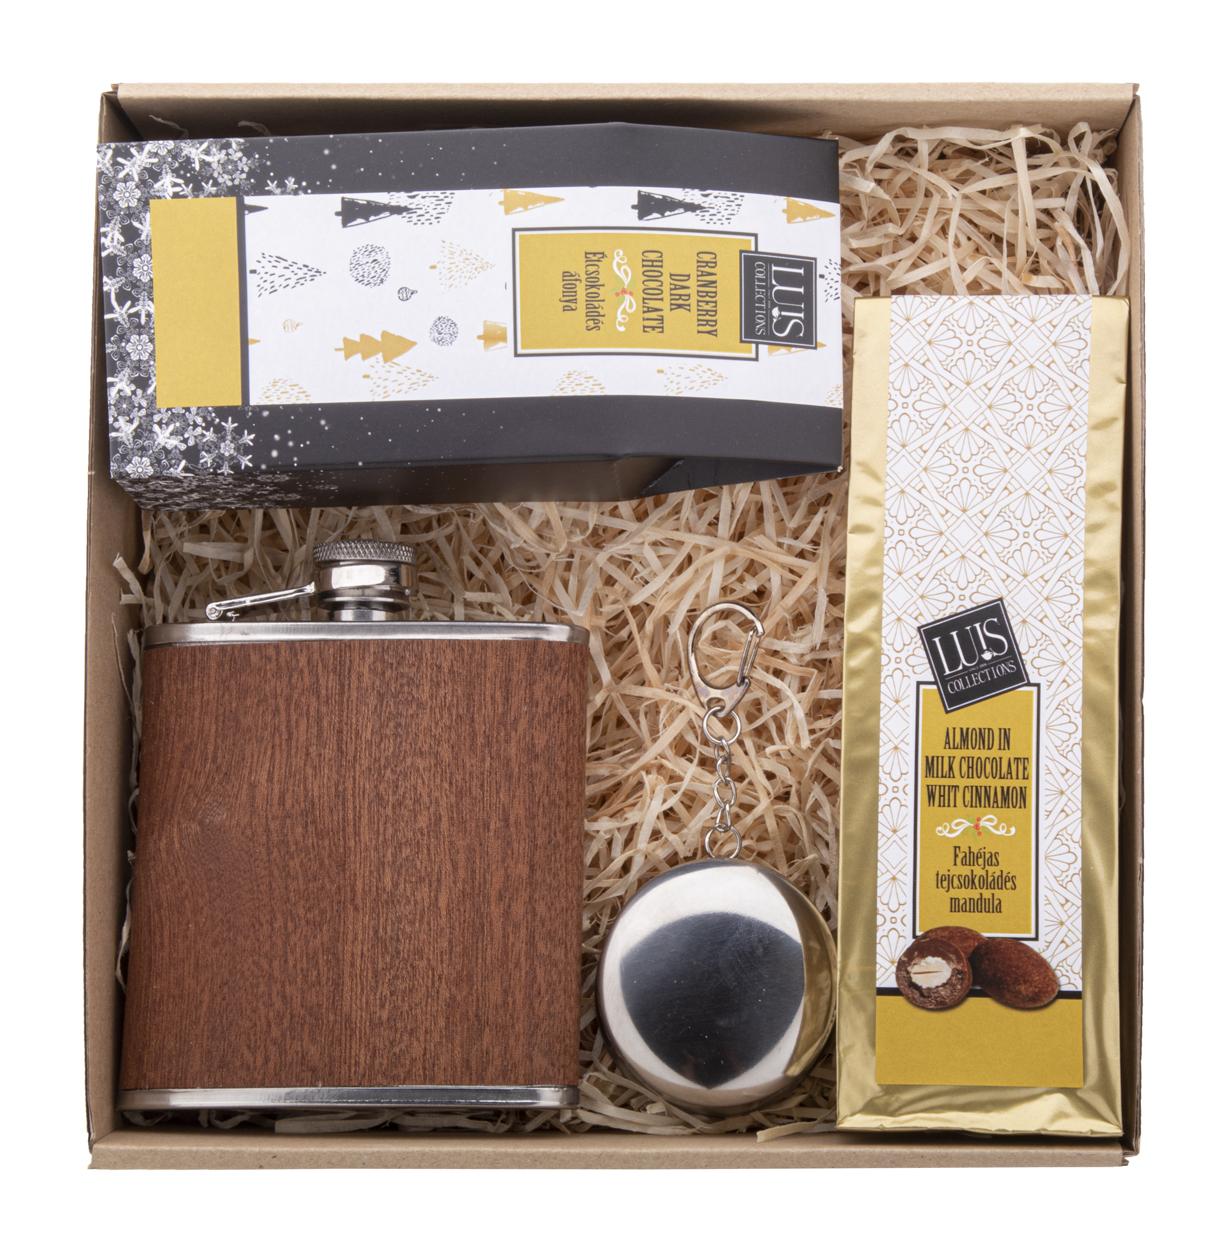 Kilsbergen chocolate and spirit gift set